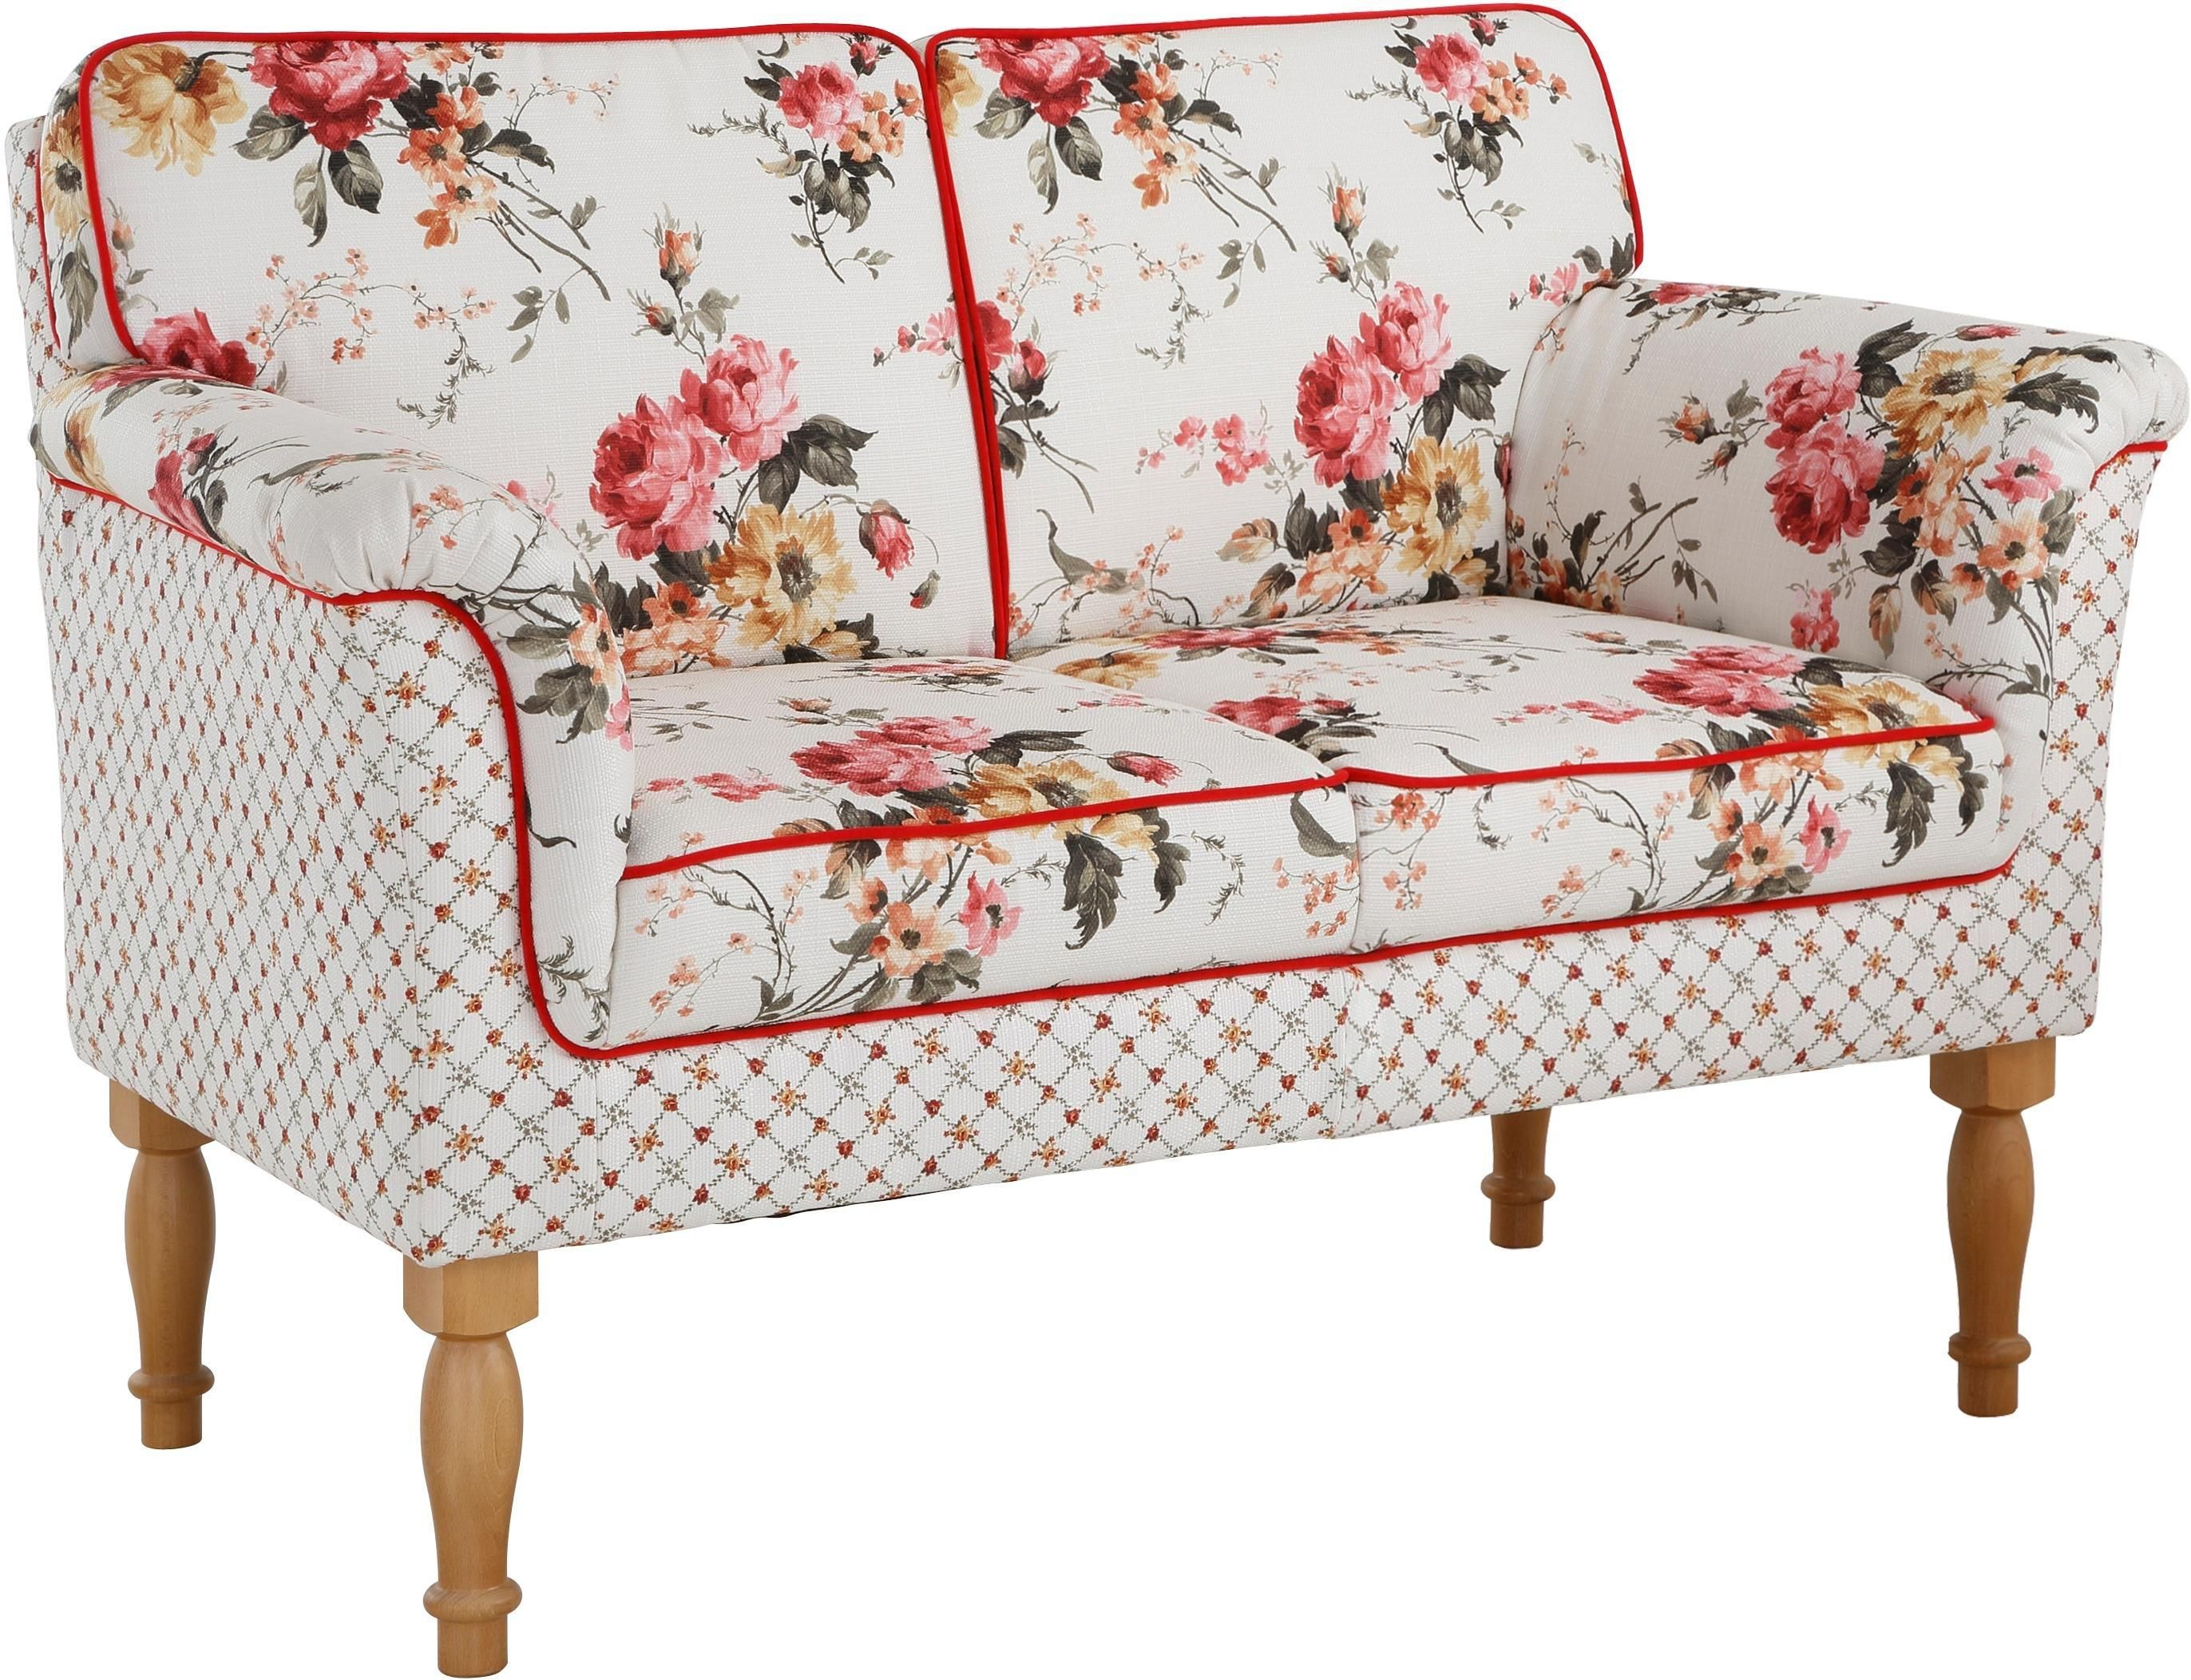 Couch Xxl Big Sofa Kolonialstil 50 Reduziert Ecksofa Mit